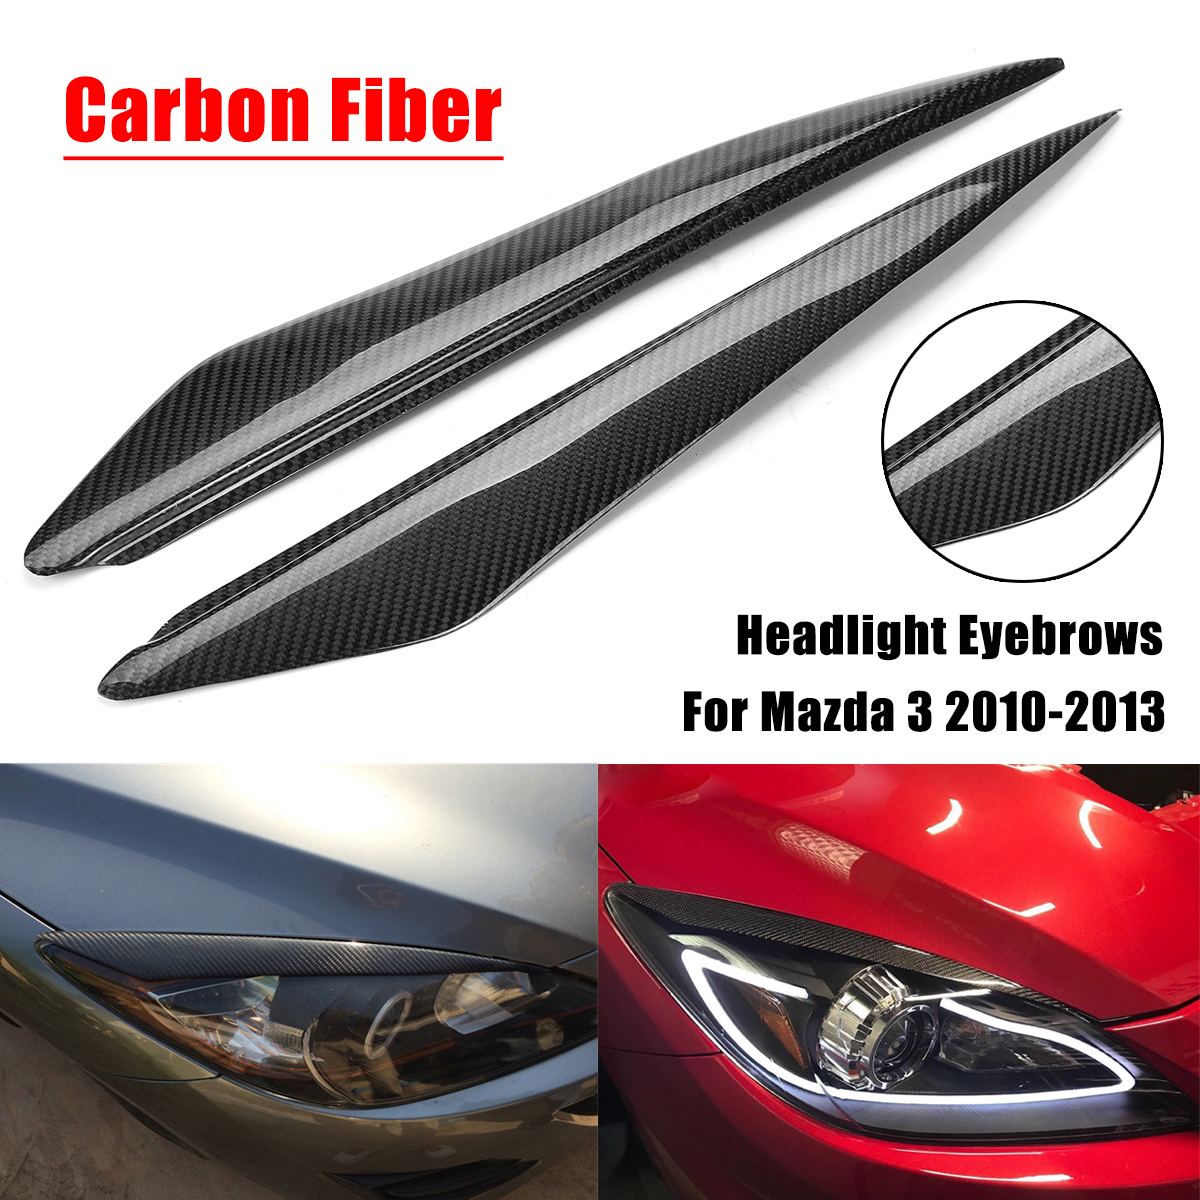 1Pair Carbon Fiber Headlight Eyebrows Cover Eyelids Trim for Mazda 3 2010-2013 Car Styling for Front Headlamp стоимость